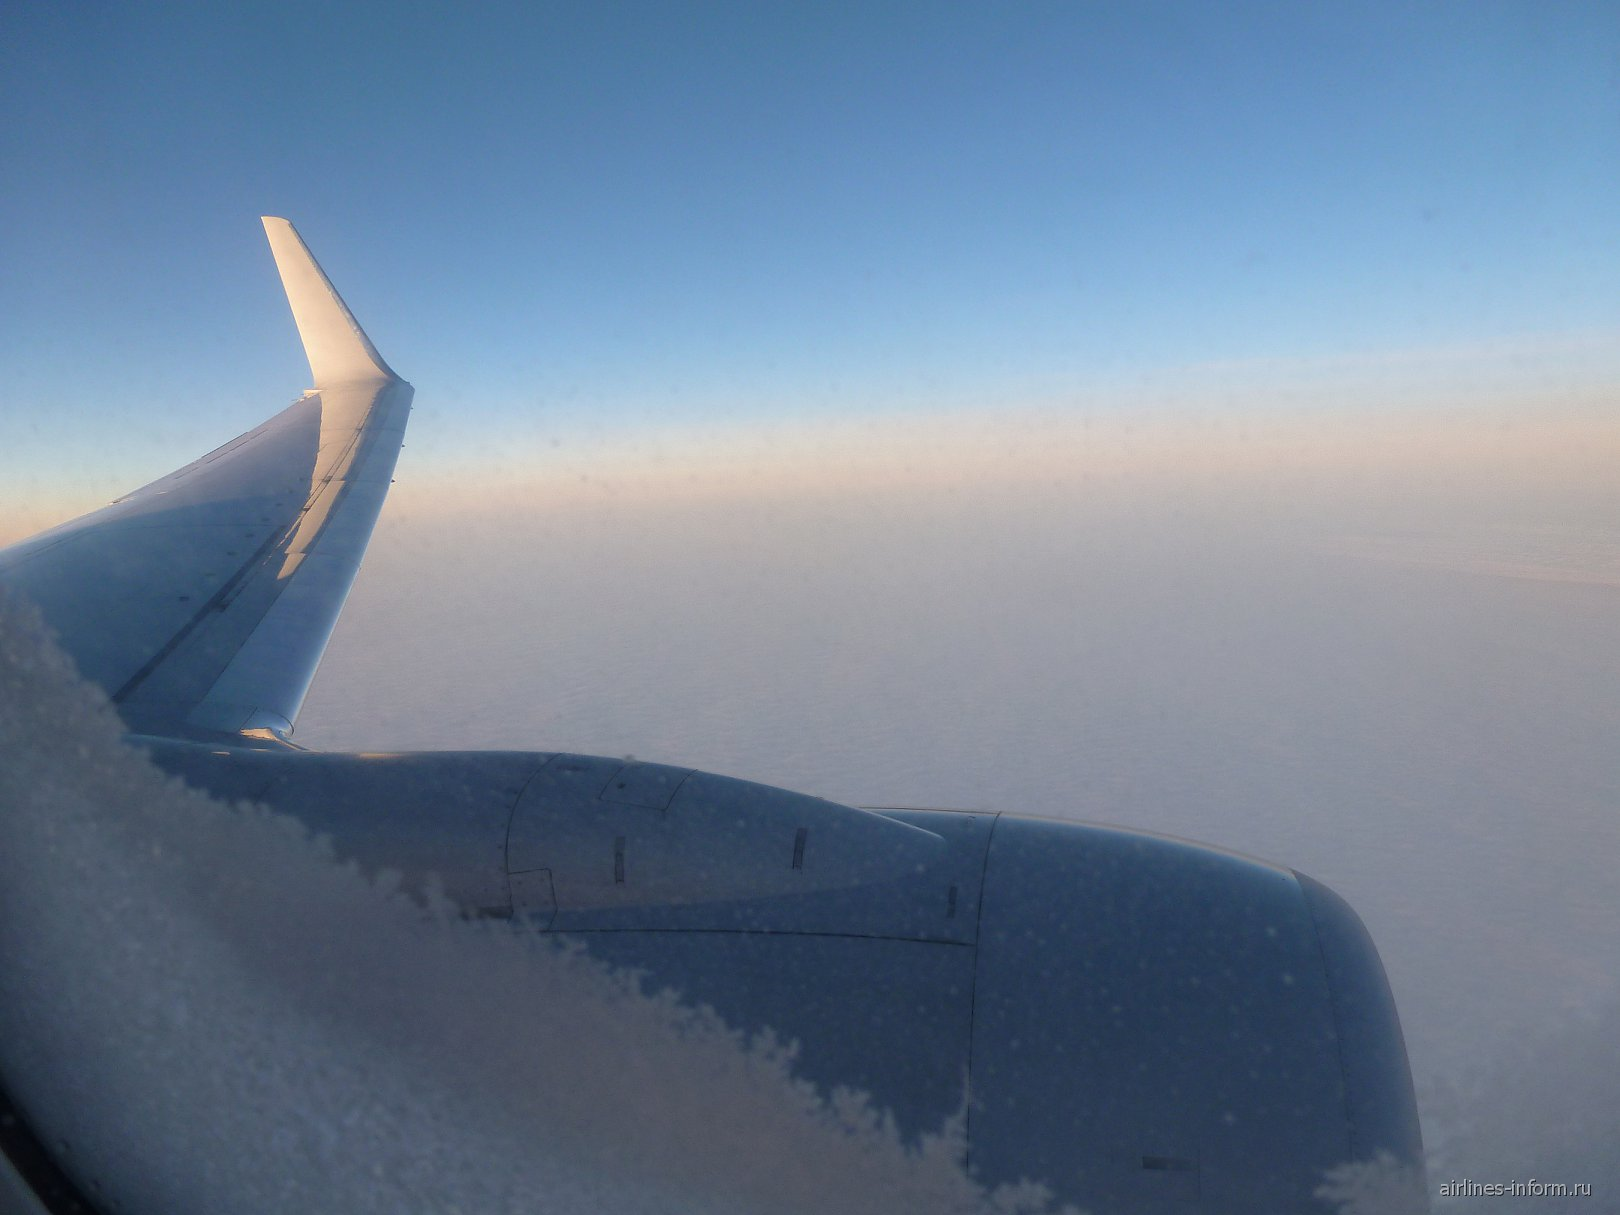 Рейс Москва-Ноябрьск авиакомпании ЮТэйр